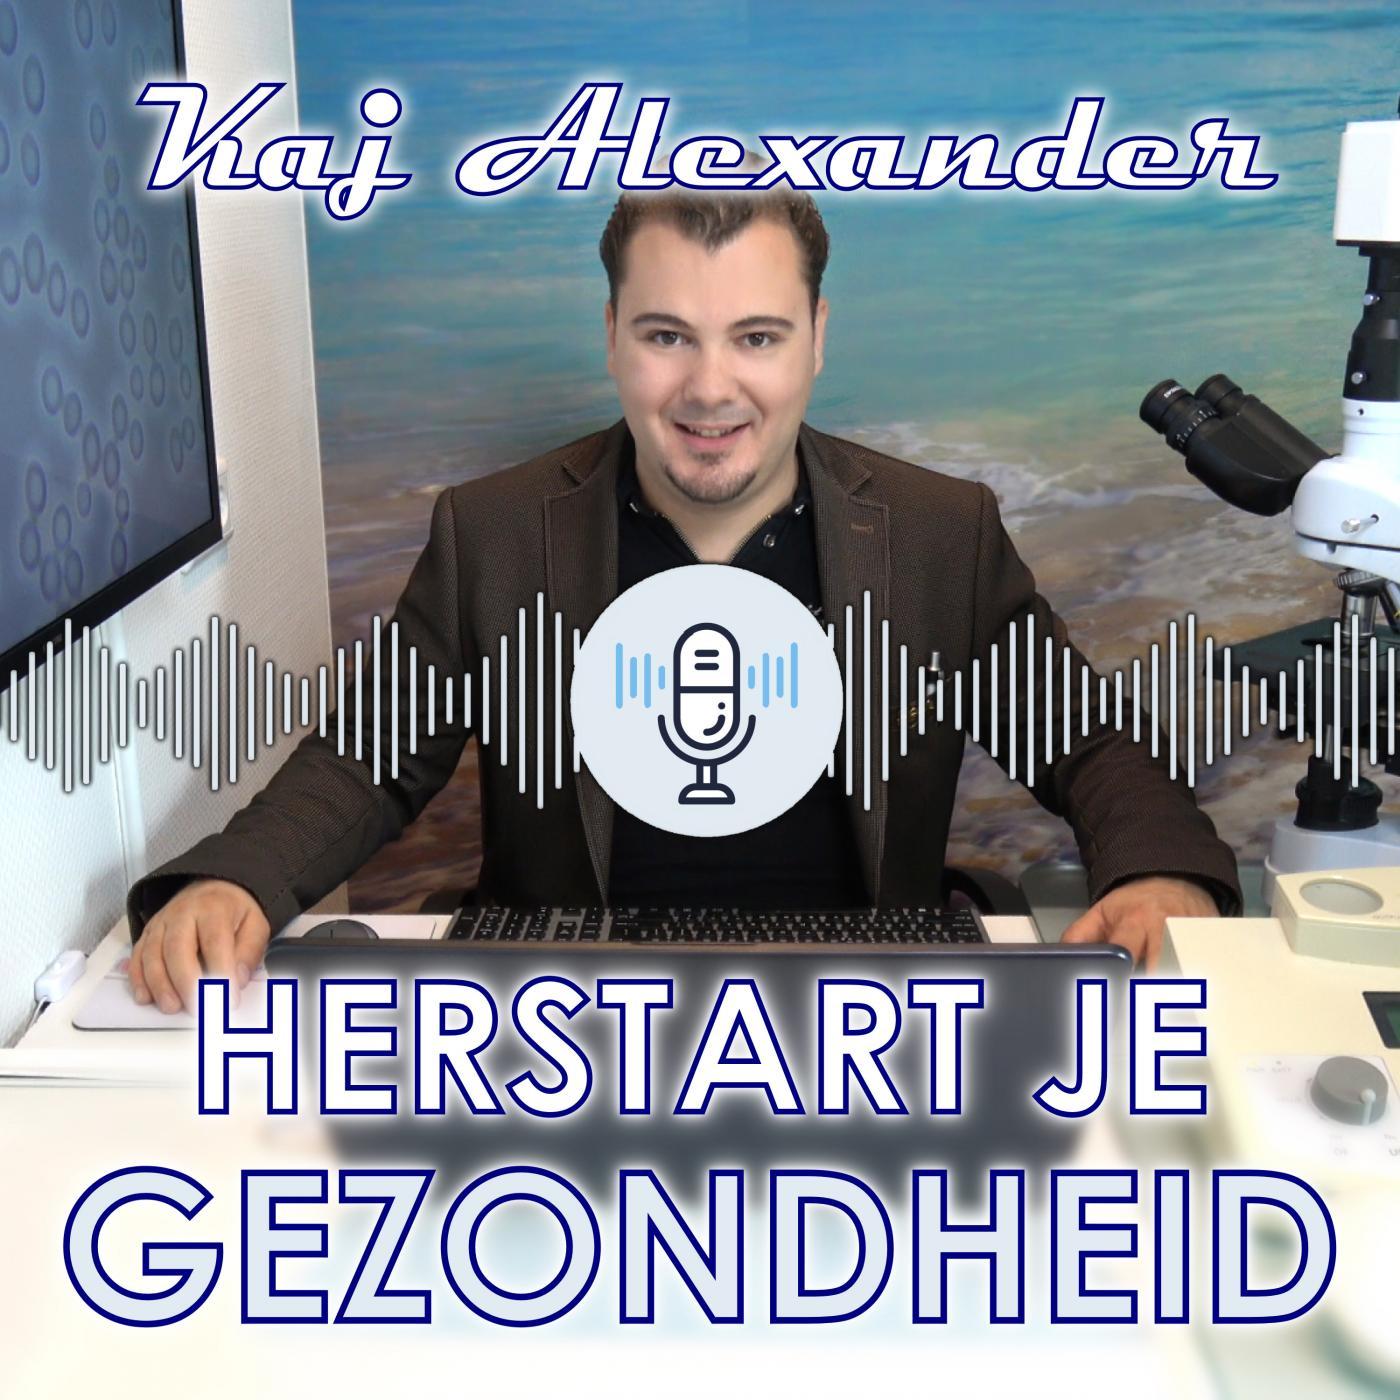 HERSTART JE GEZONDHEID logo